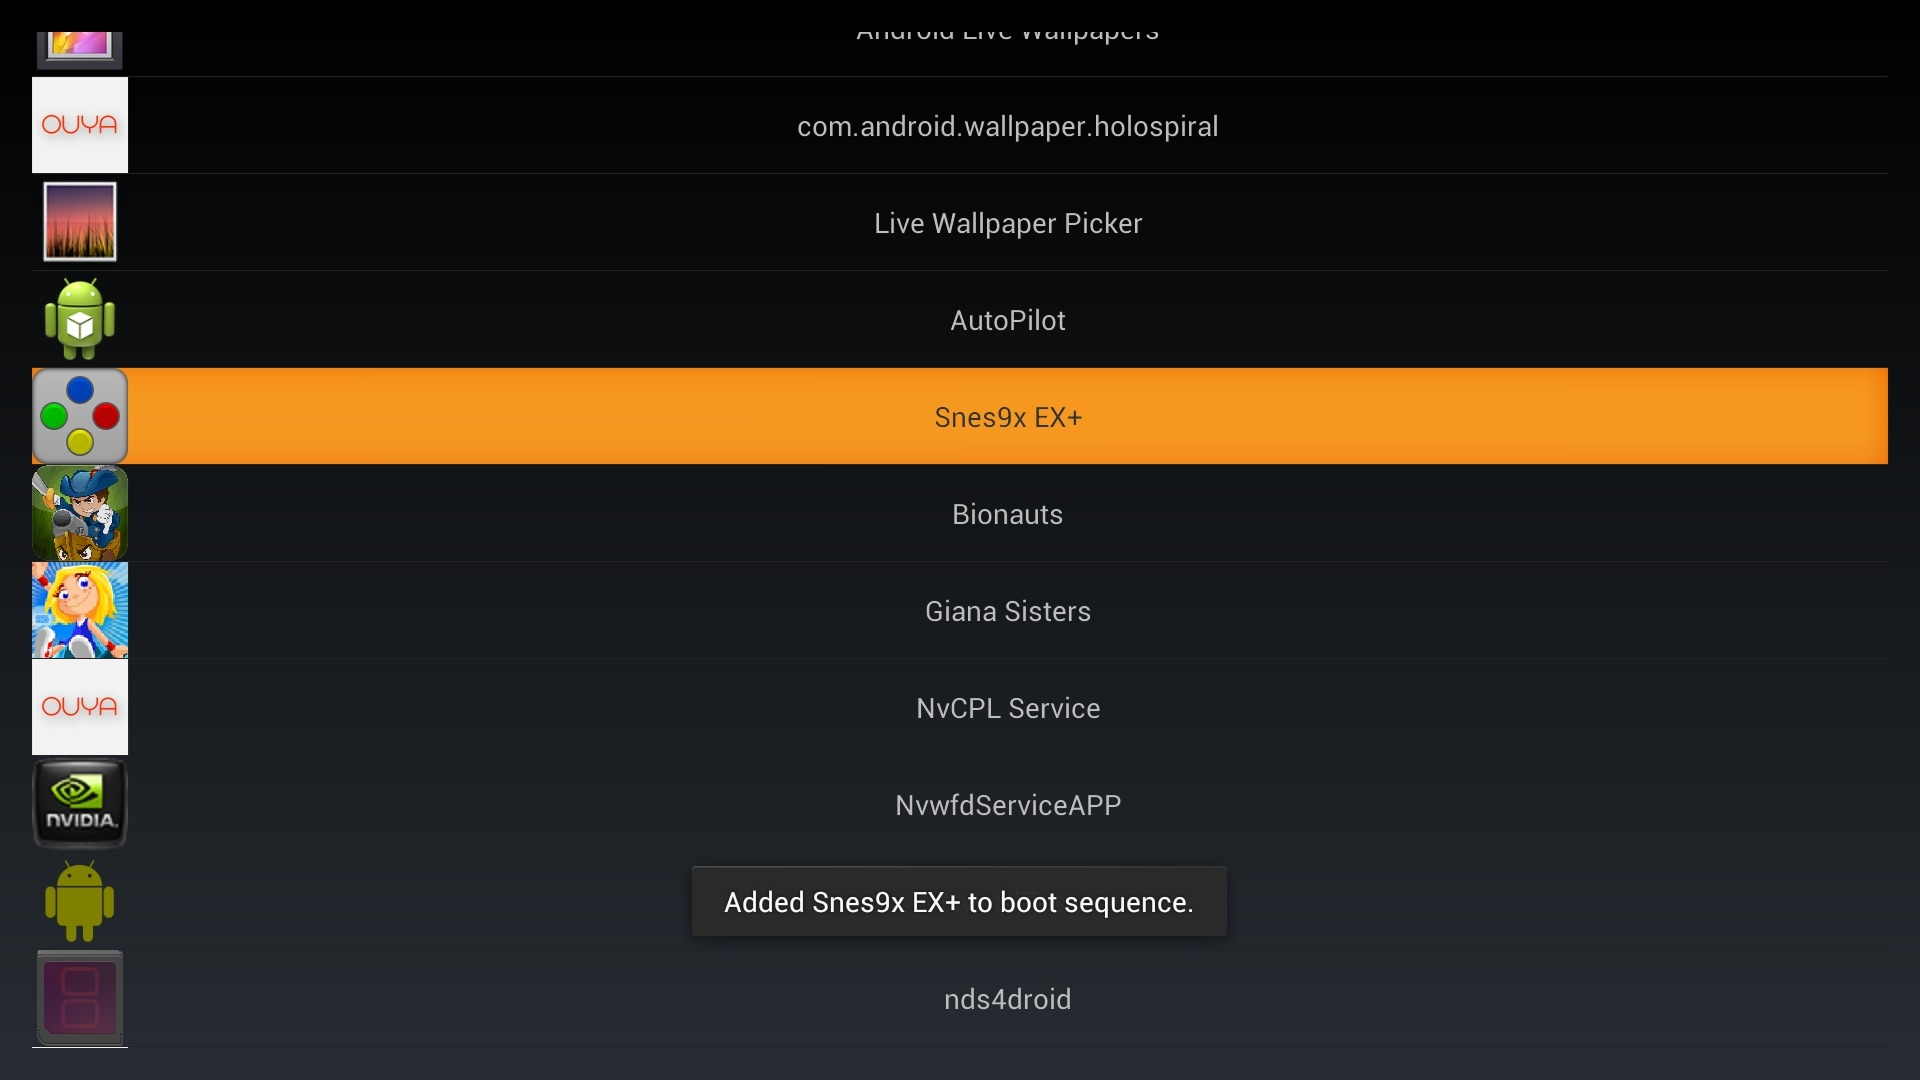 AutoPilot screenshot